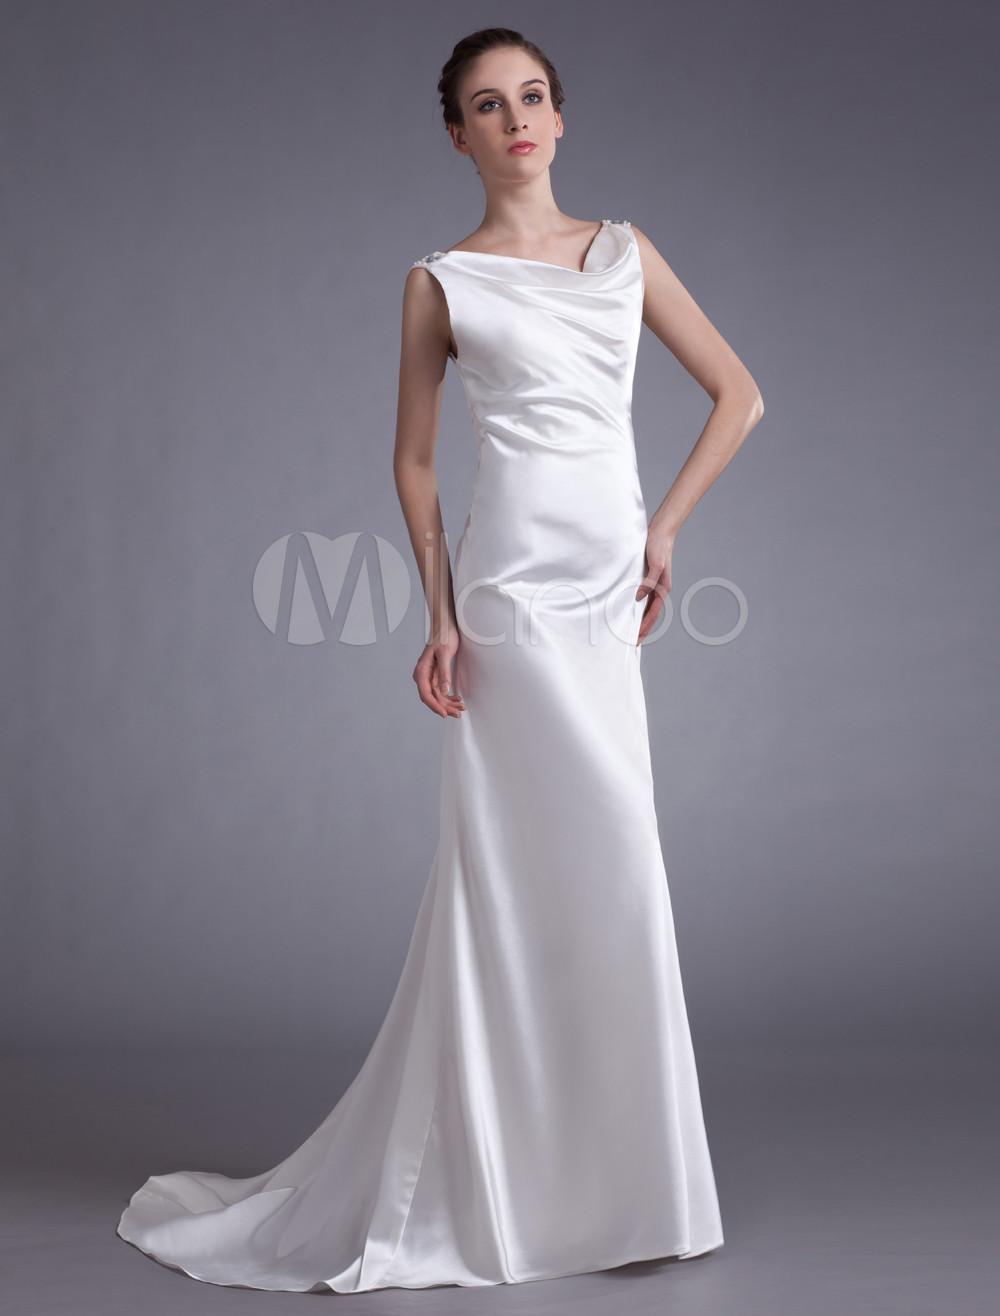 Grace Ivory Elastic Woven Satin Beading Womens Evening Dress (Wedding Evening Dresses) photo